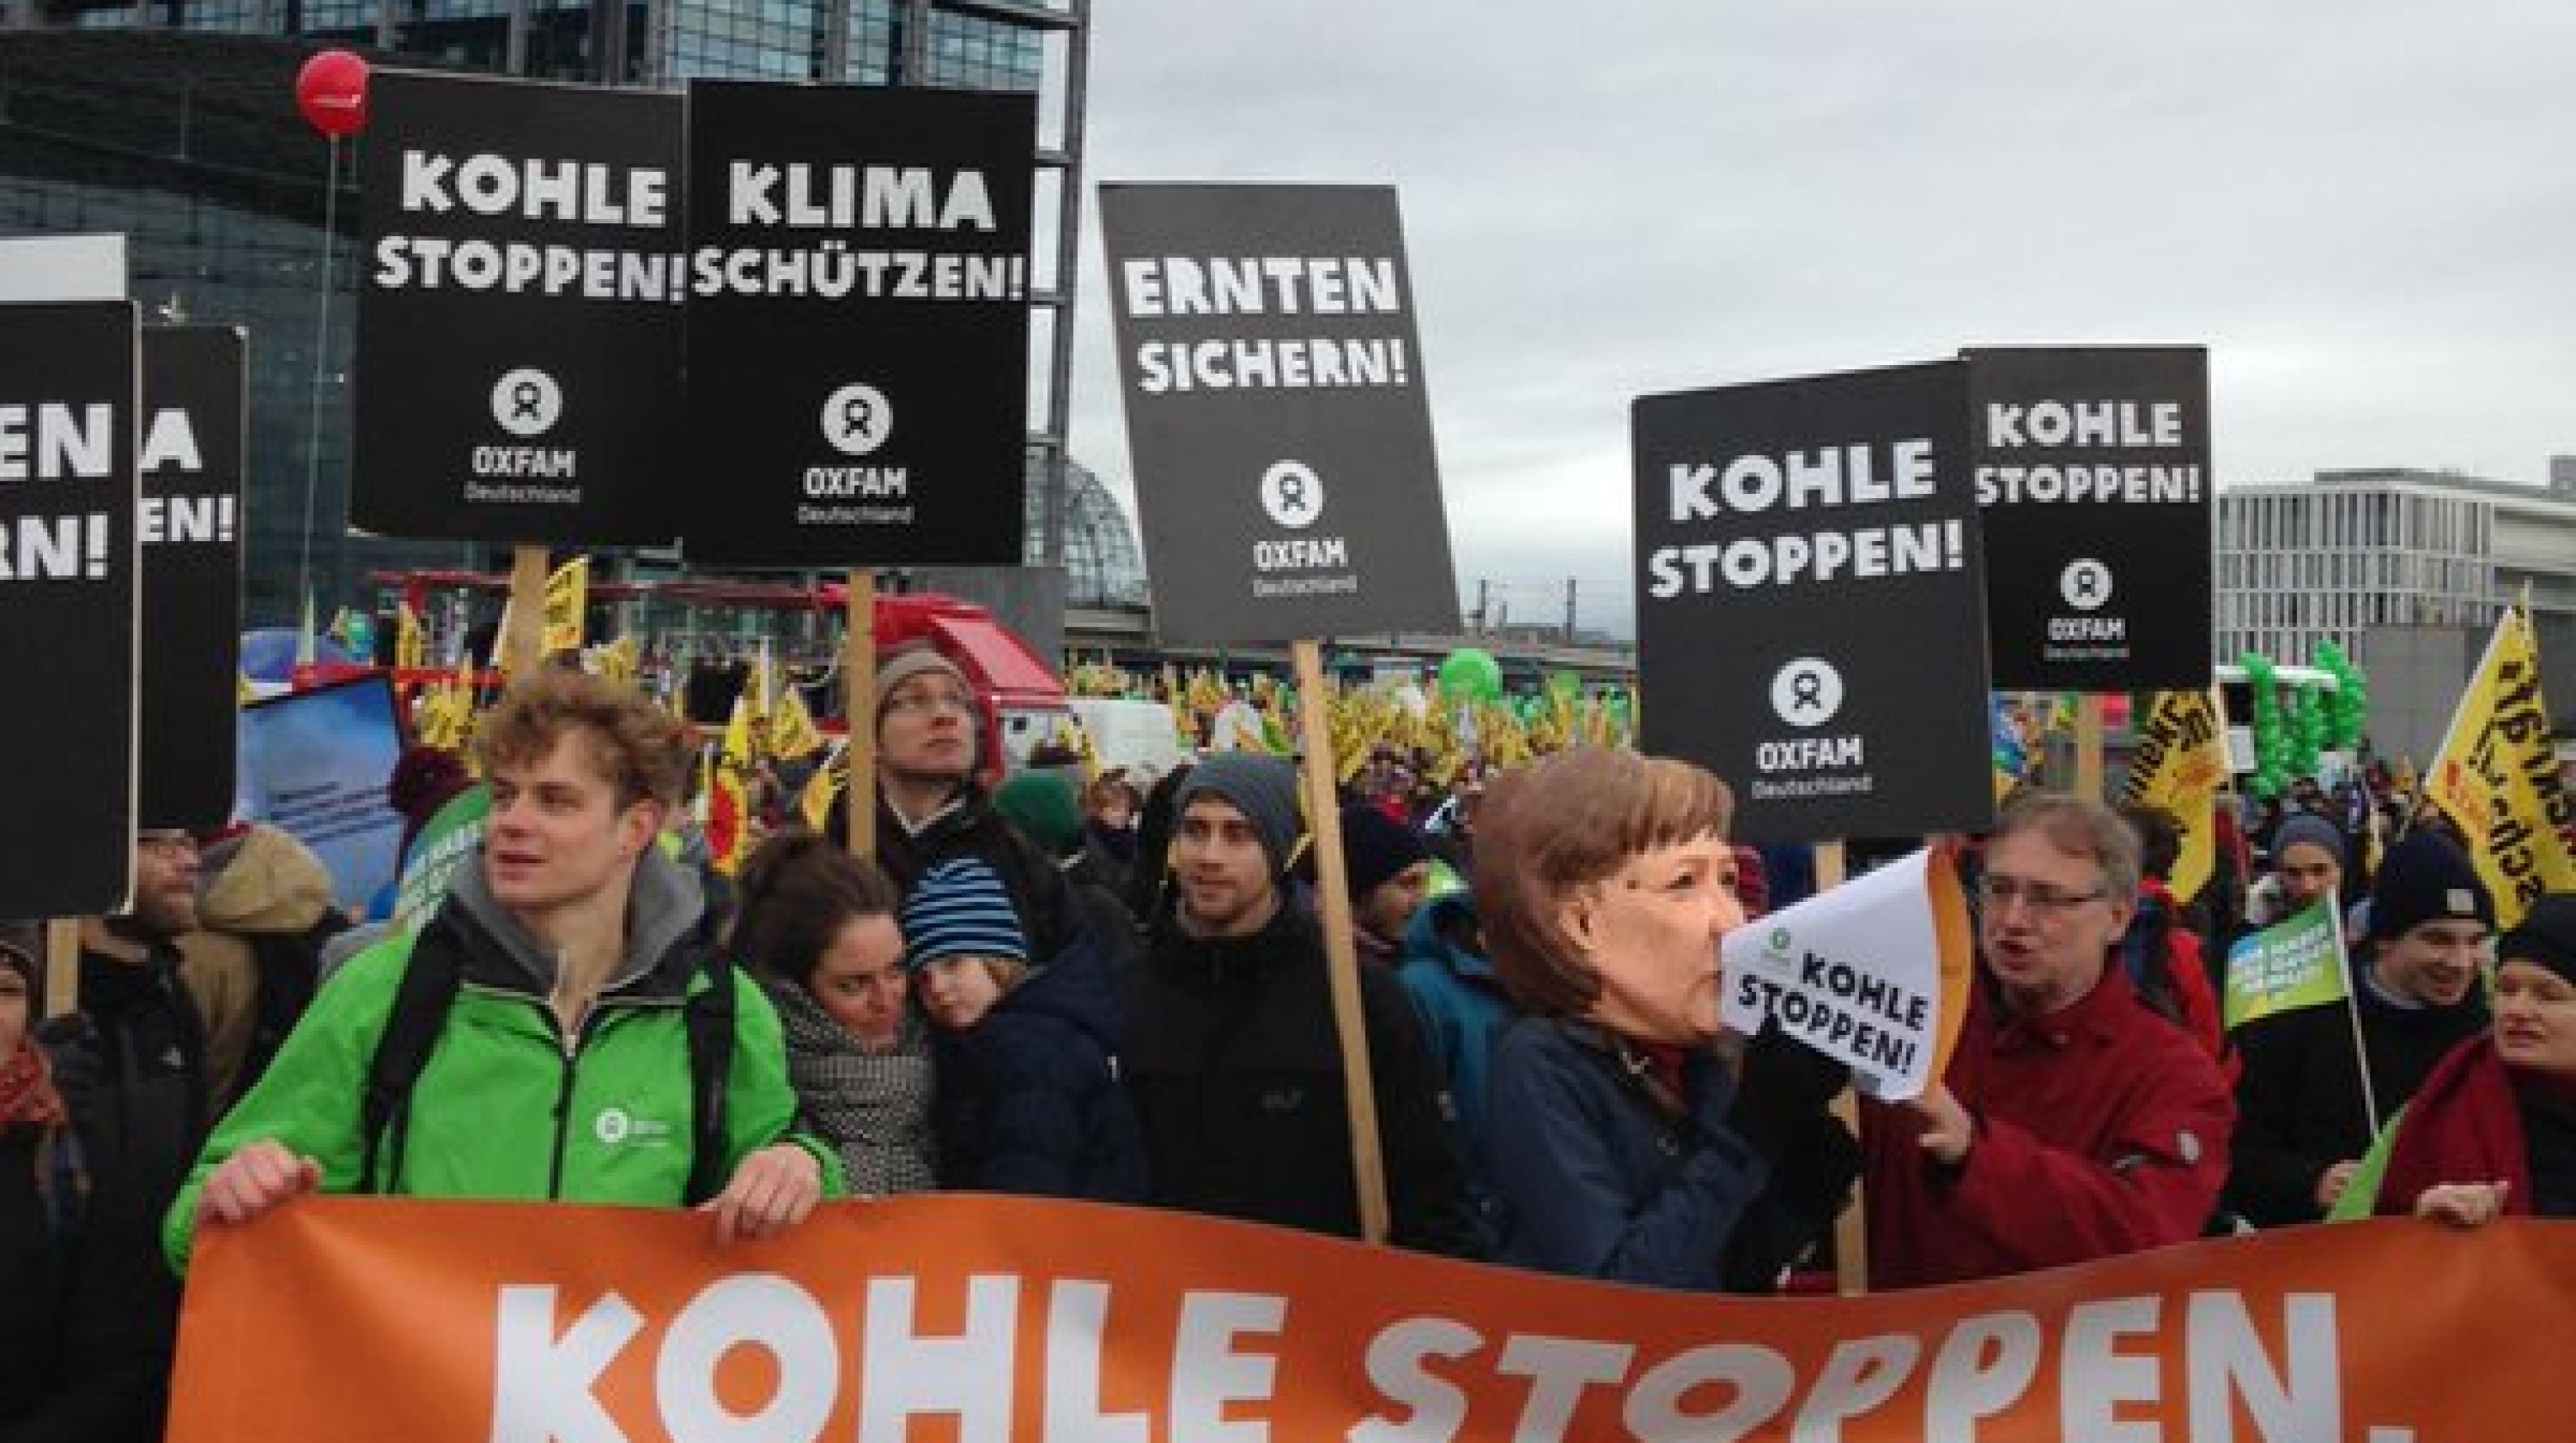 Oxfam-Aktivisten/Innen beim Global Climate March in Berlin, 29.11.2015